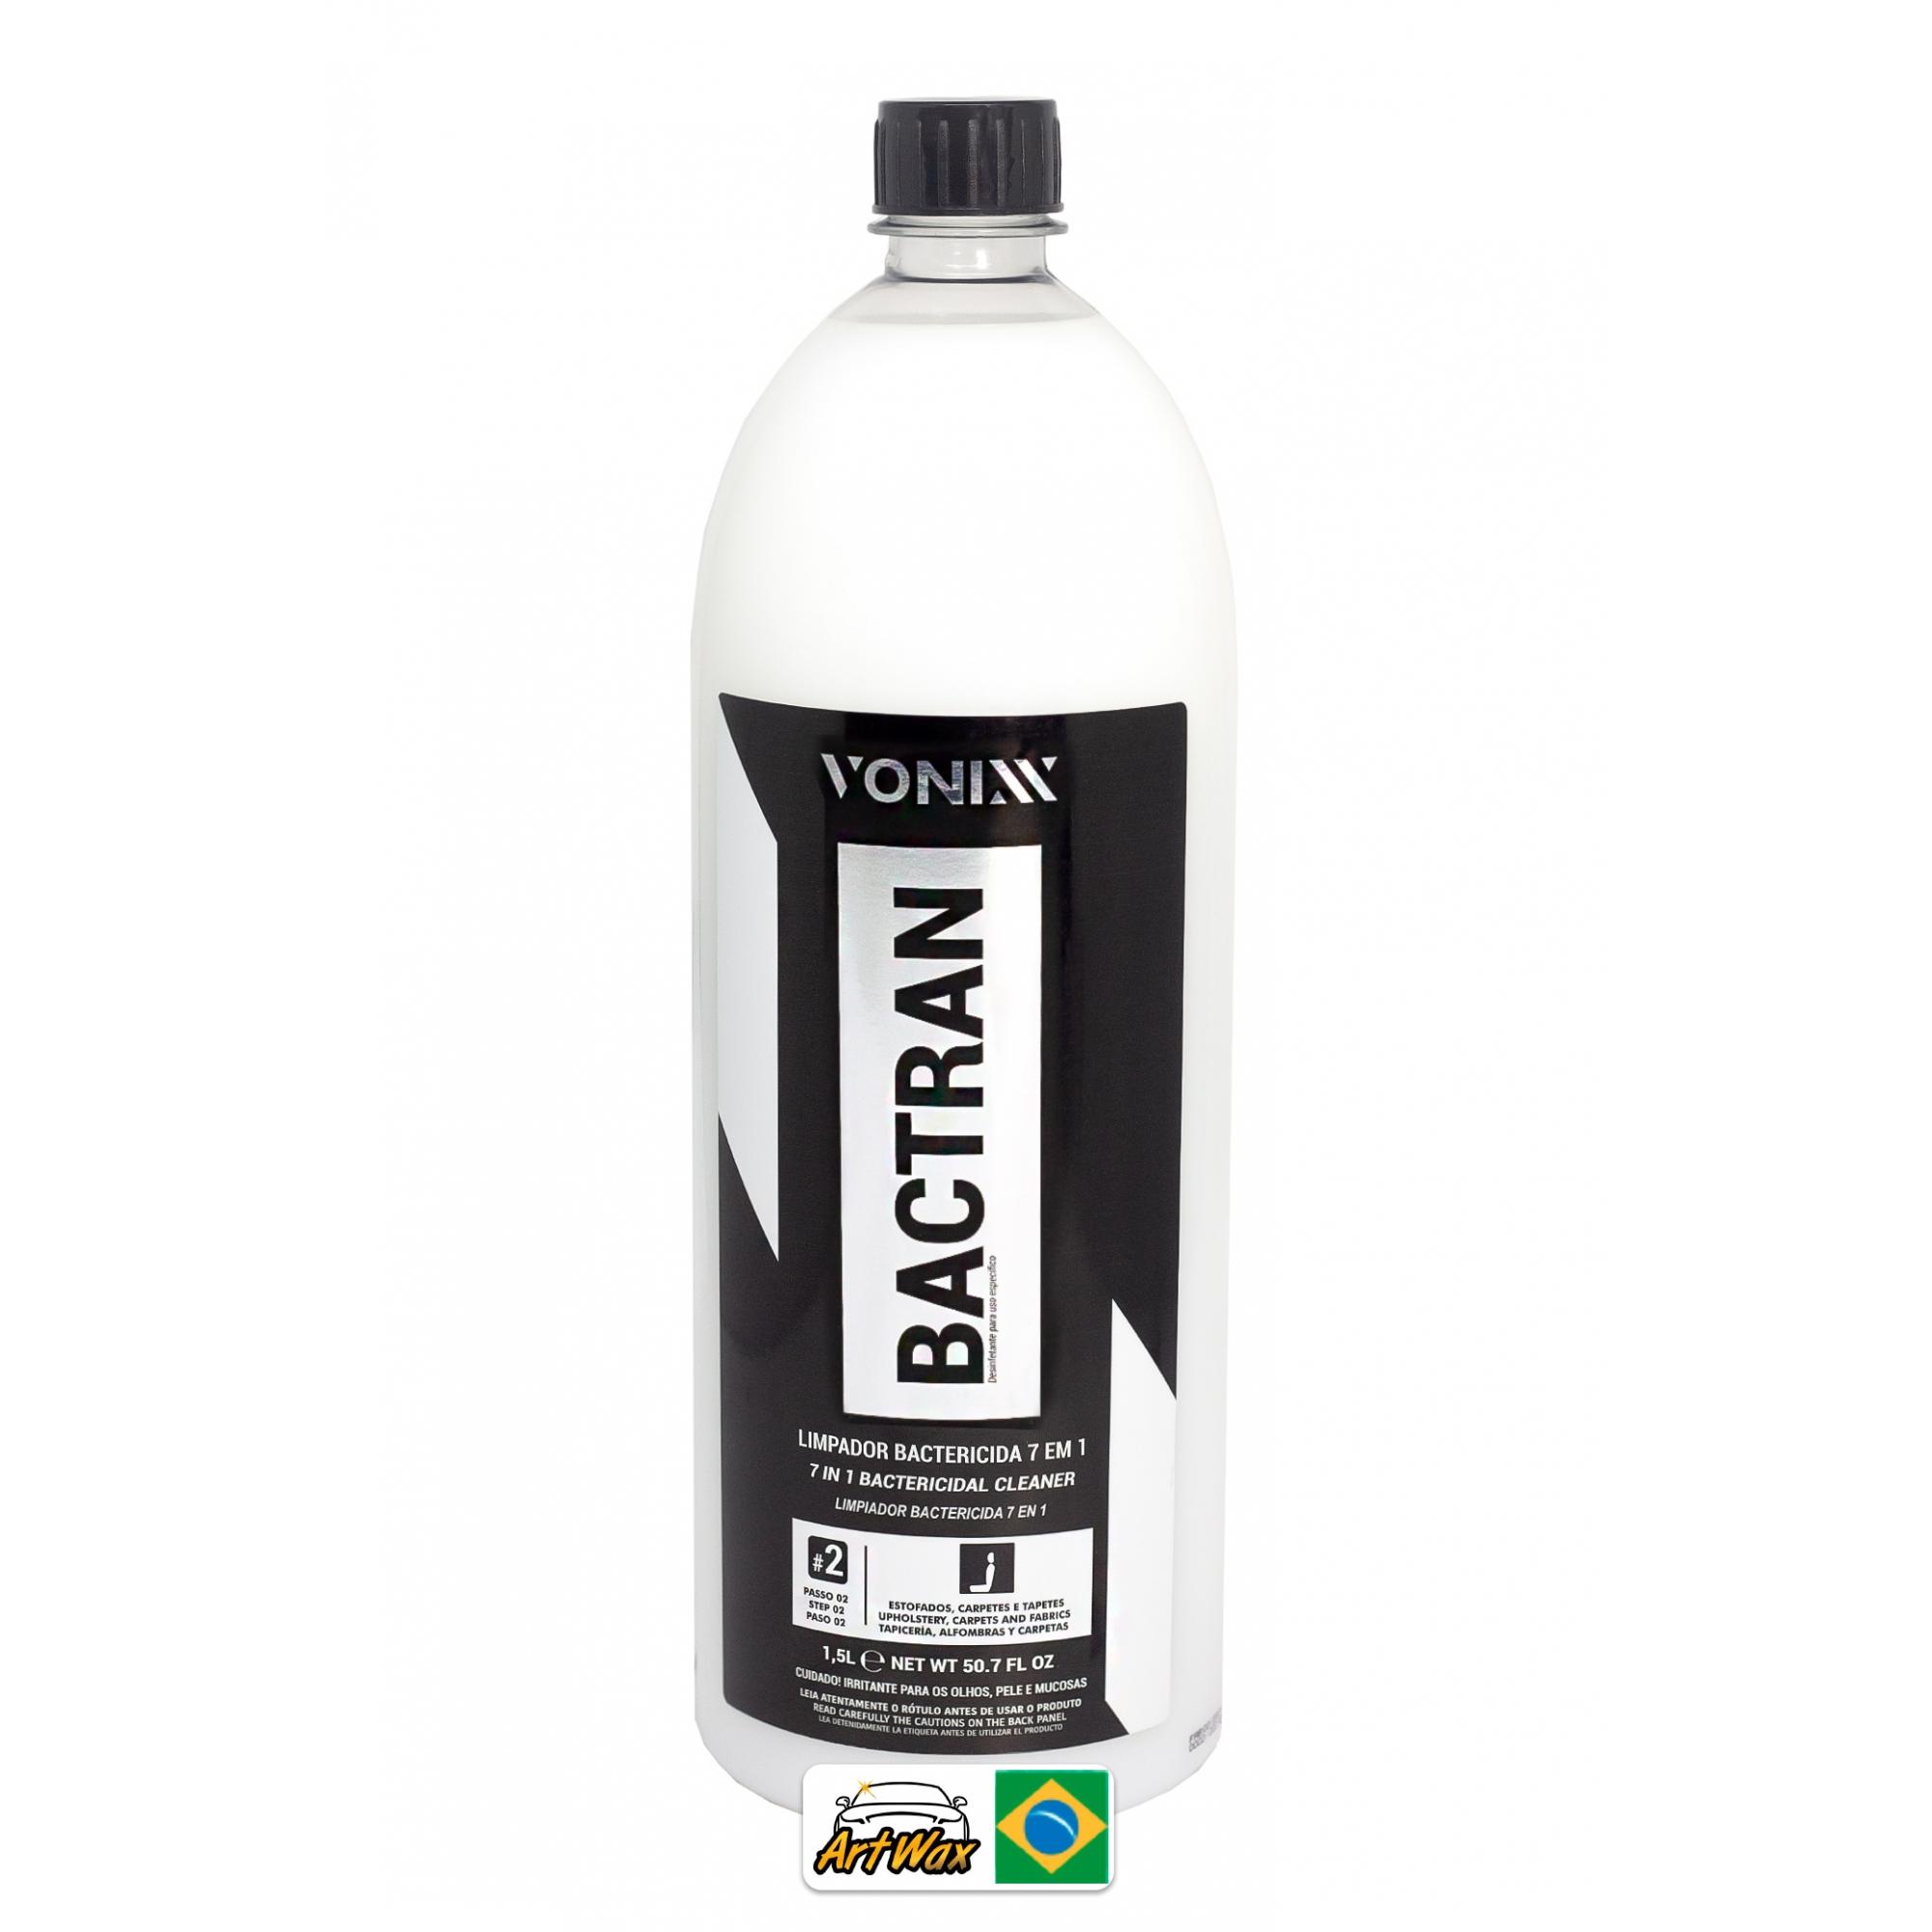 Vonixx Bactran 1,5L Concentrado - Limpador Bactericida Estofados e Carpetes = VSC 2